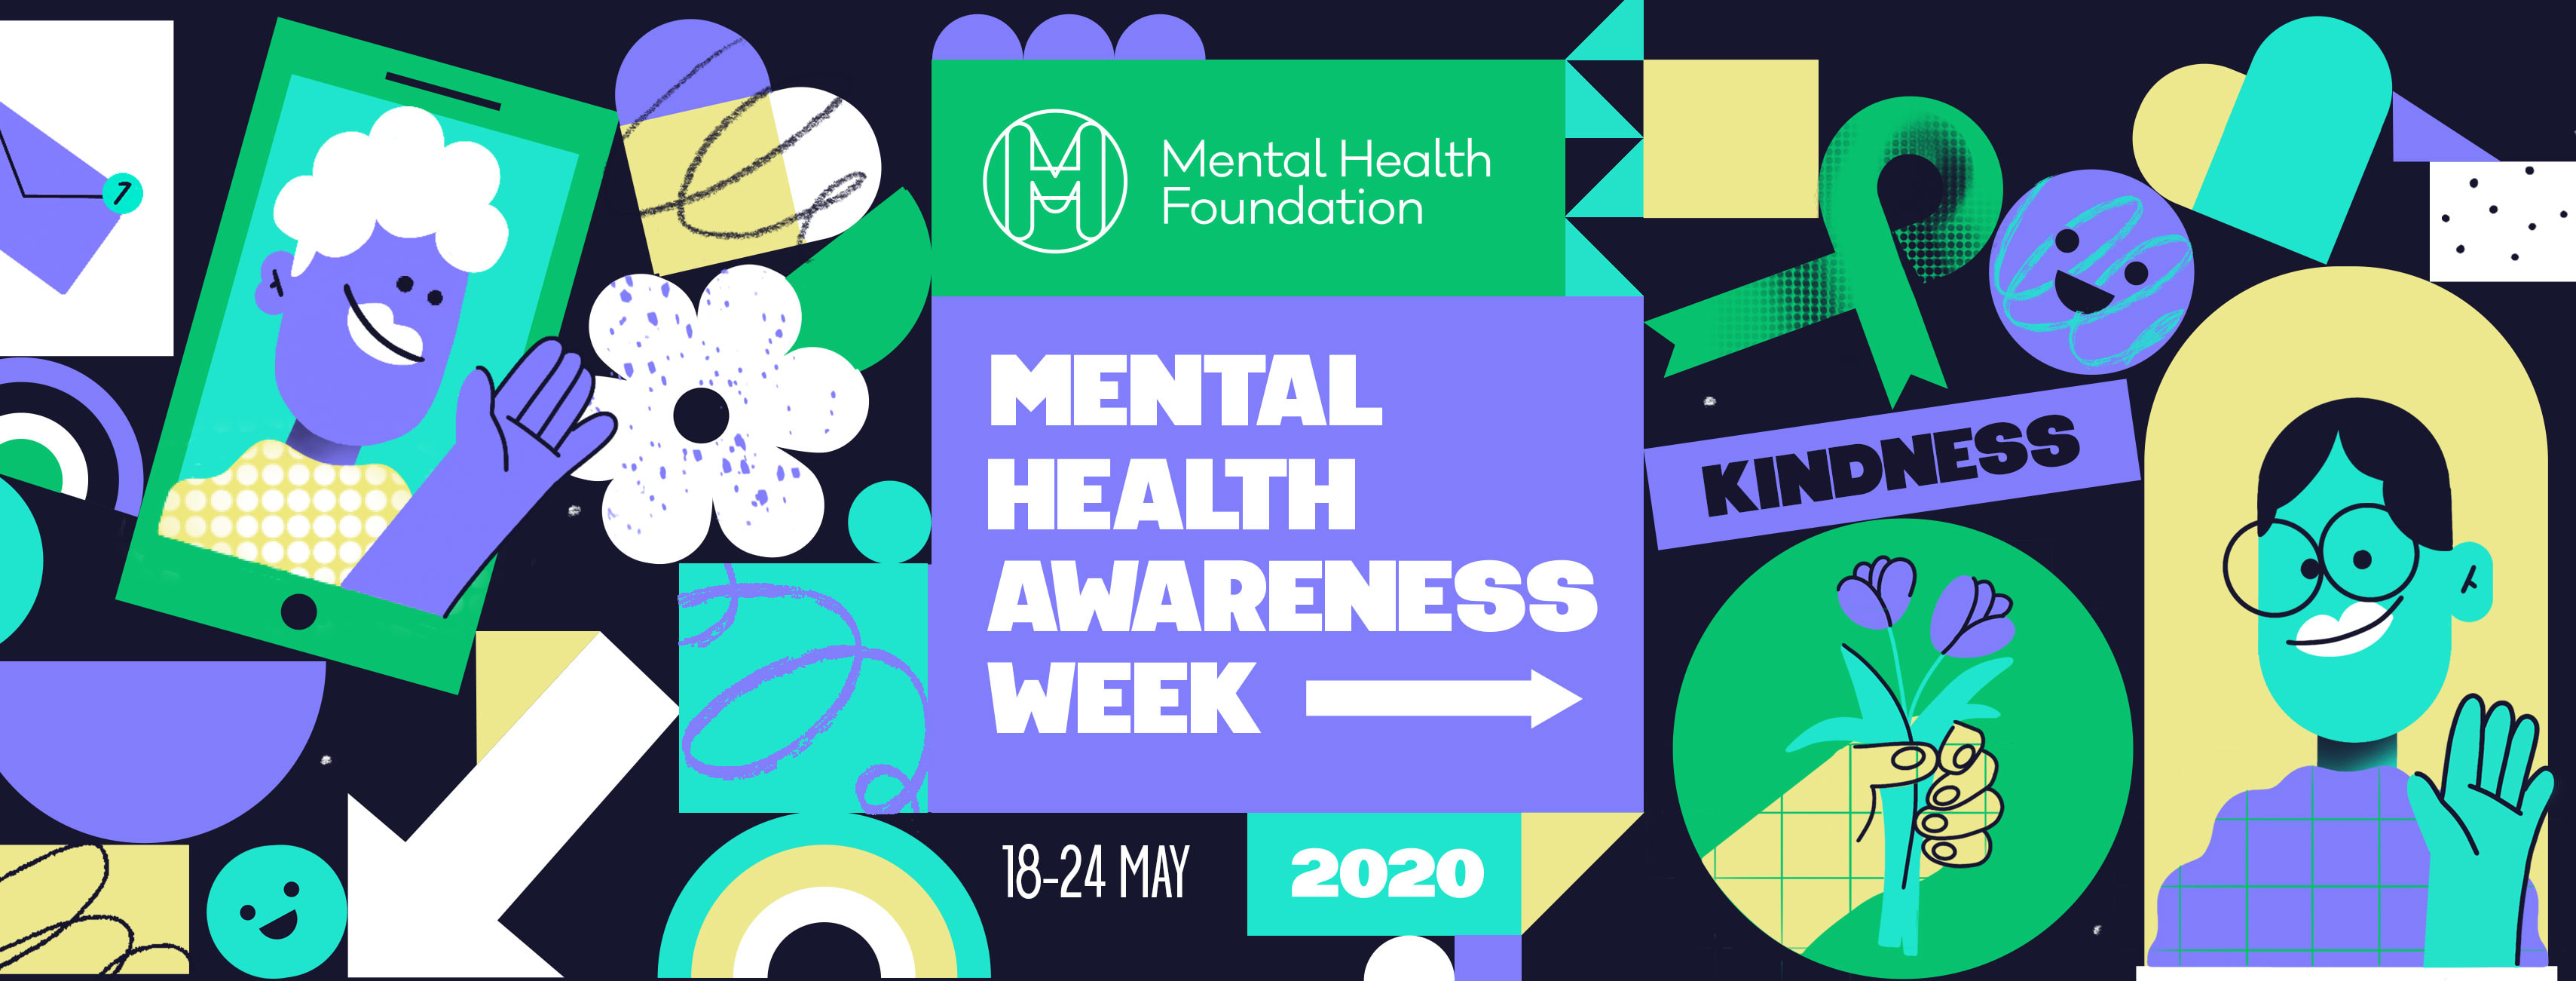 Mental Health Awareness Week 2020 | Backstage Academy